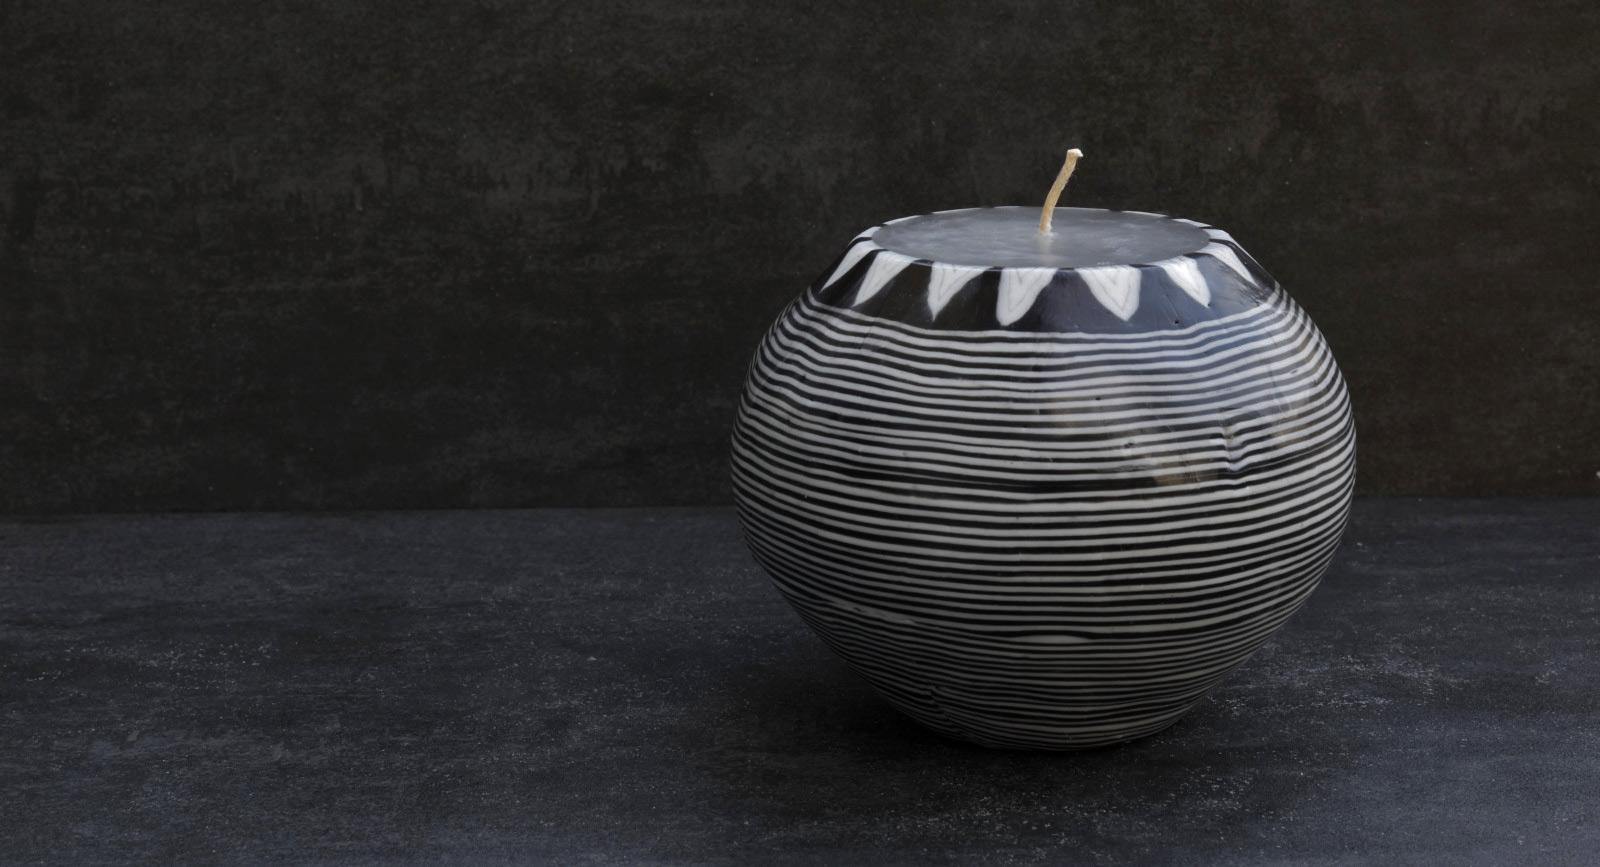 Kerze Modell Black Lines, Farbe: schwarz-weiss, Form: Pot. Handgemachte Designkerze. Kerzen online kaufen